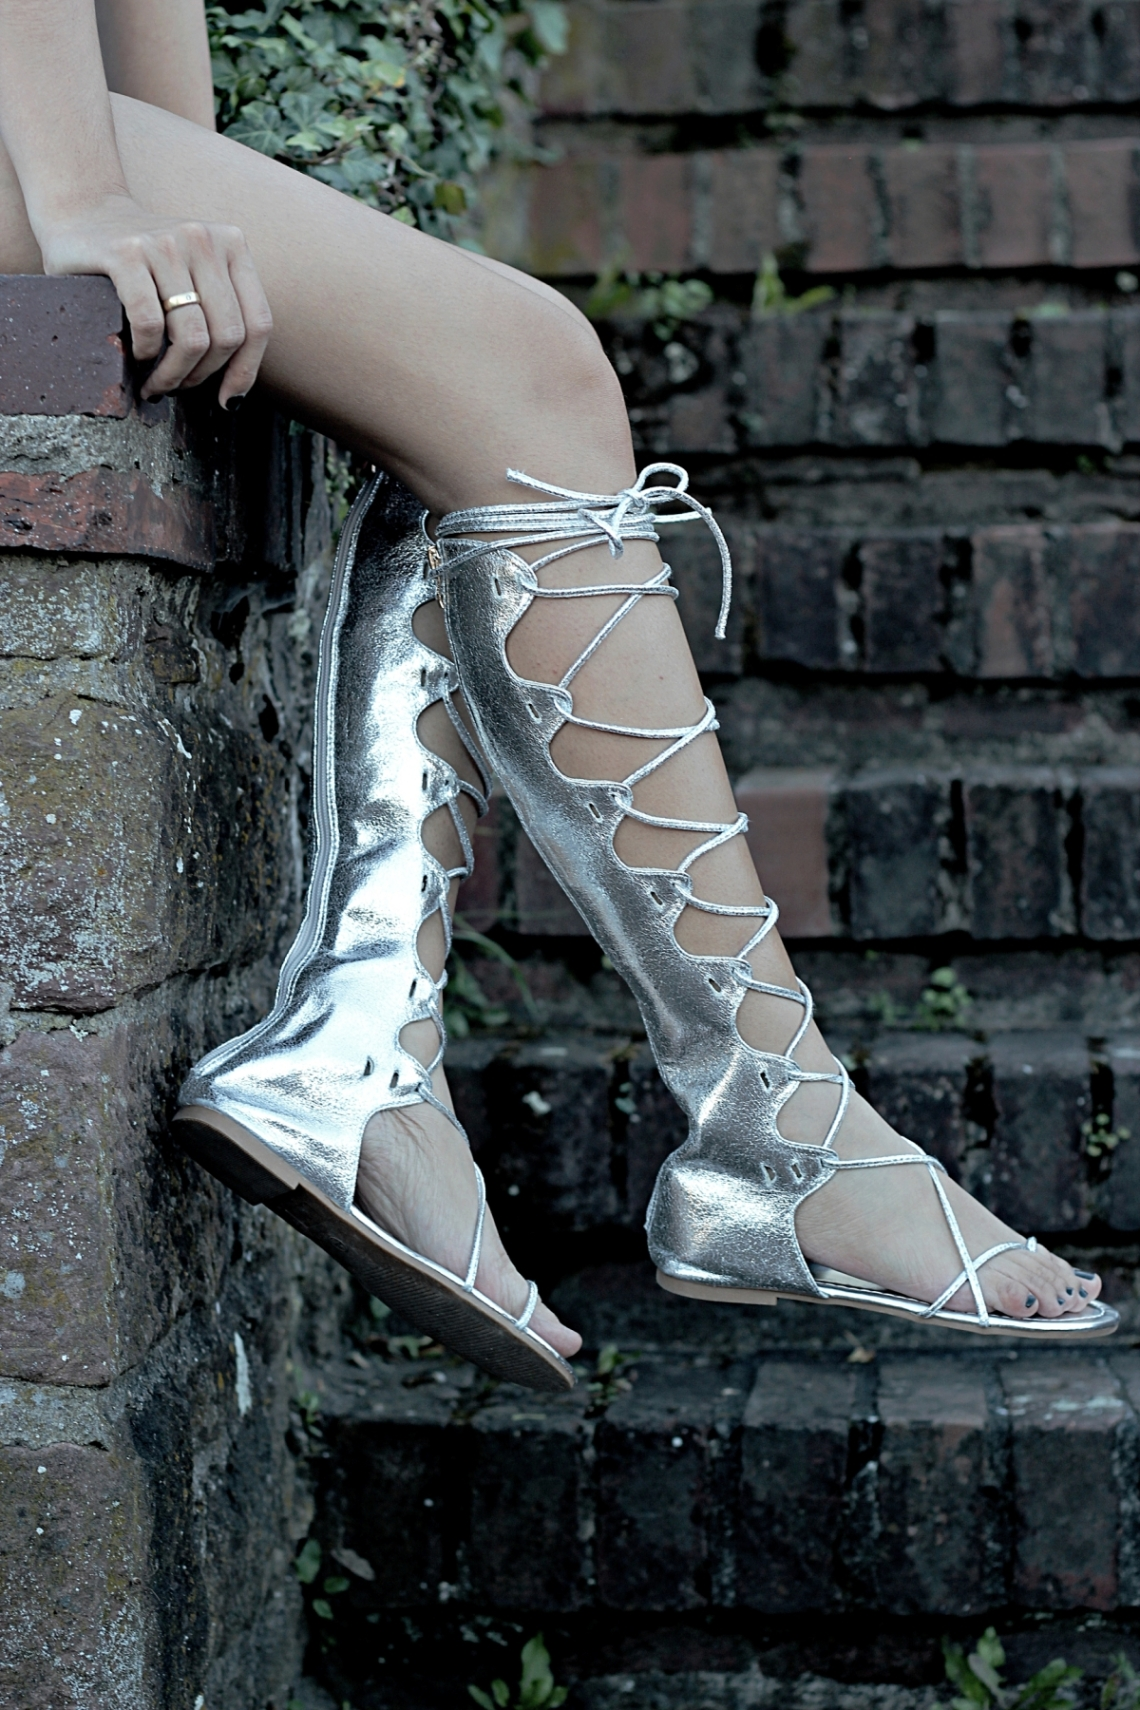 Schuhtemple24.de - Sandalen - Gladiator Sandals